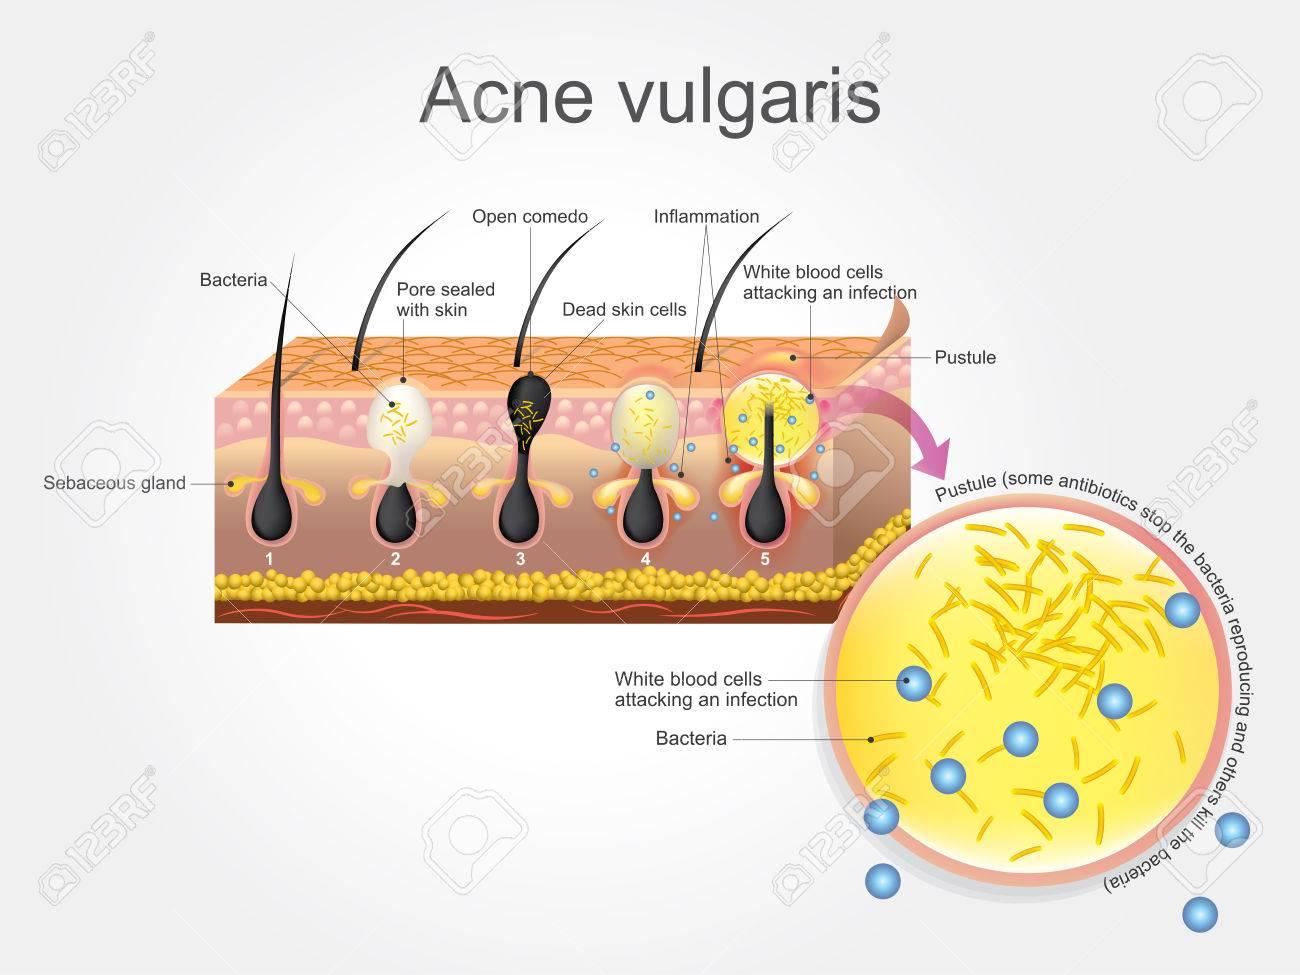 http://n3.datasn.io/data/api/v1/n3zm/image_of_skin_disease_5/main/skin_disease_image_download//08/af/a2/44/08afa244ea7ee1d3dd20eabd2283503fd06993bc.jpg